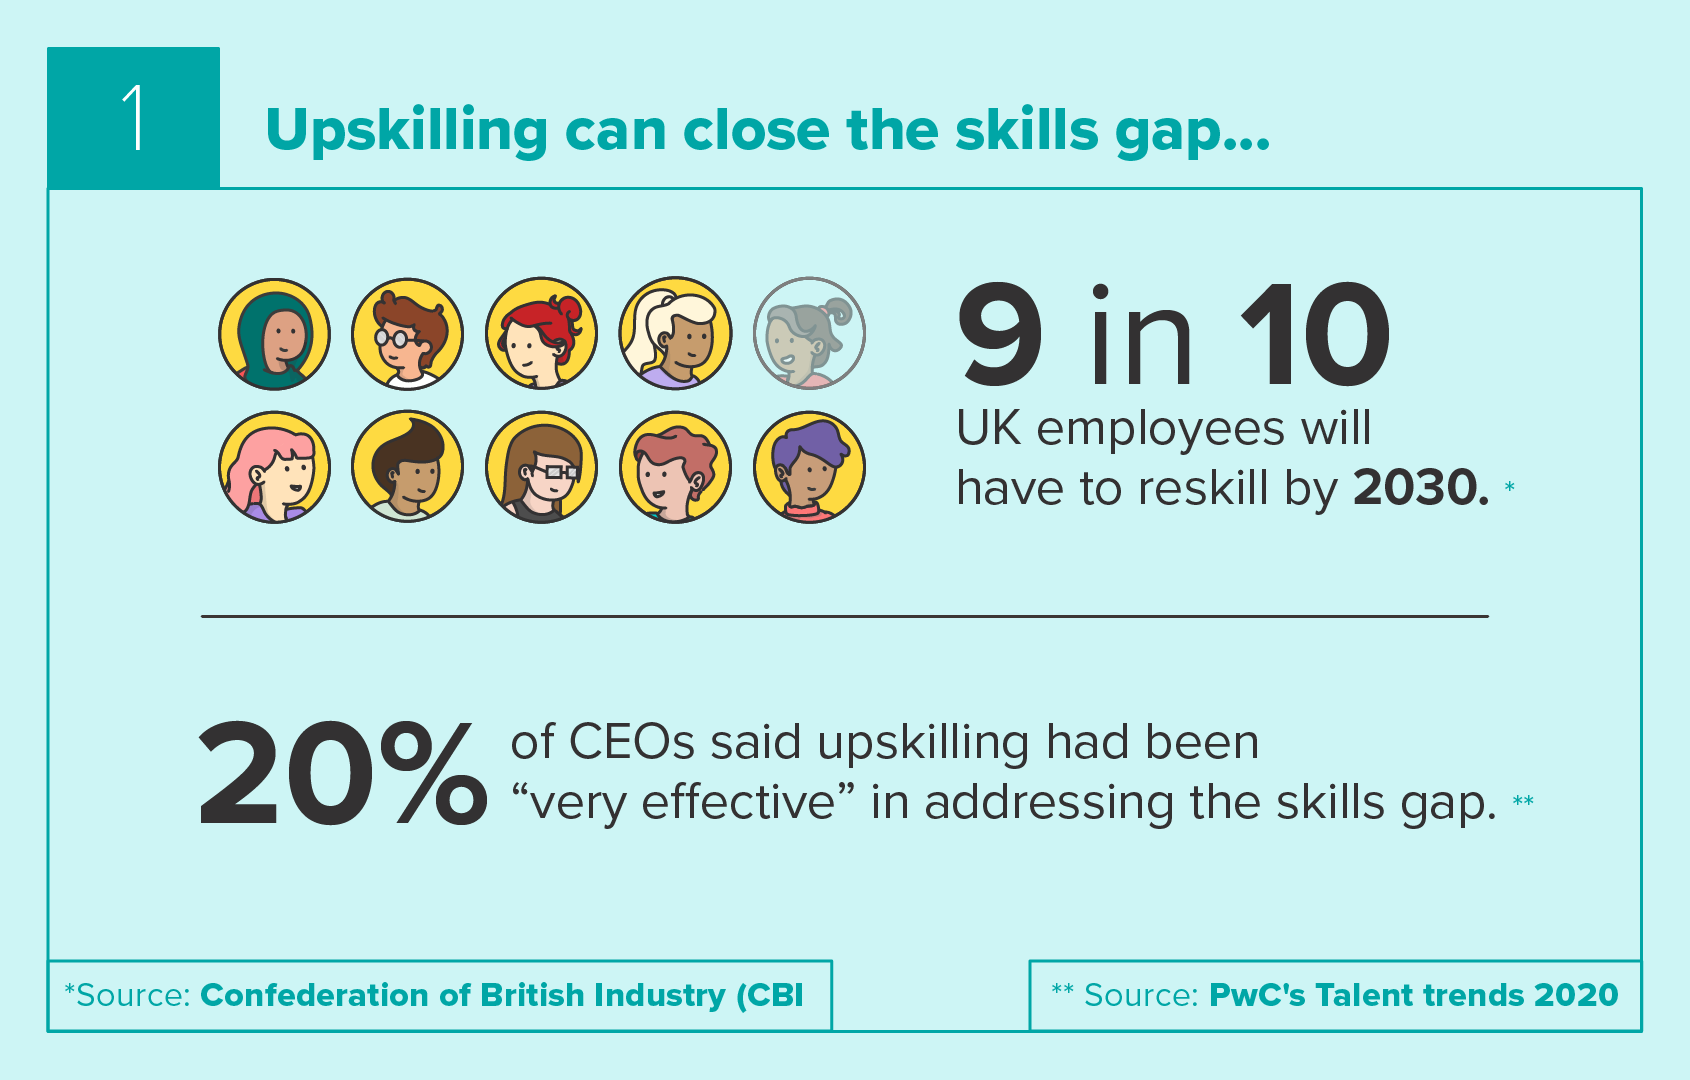 Upskilling can close the skills gap